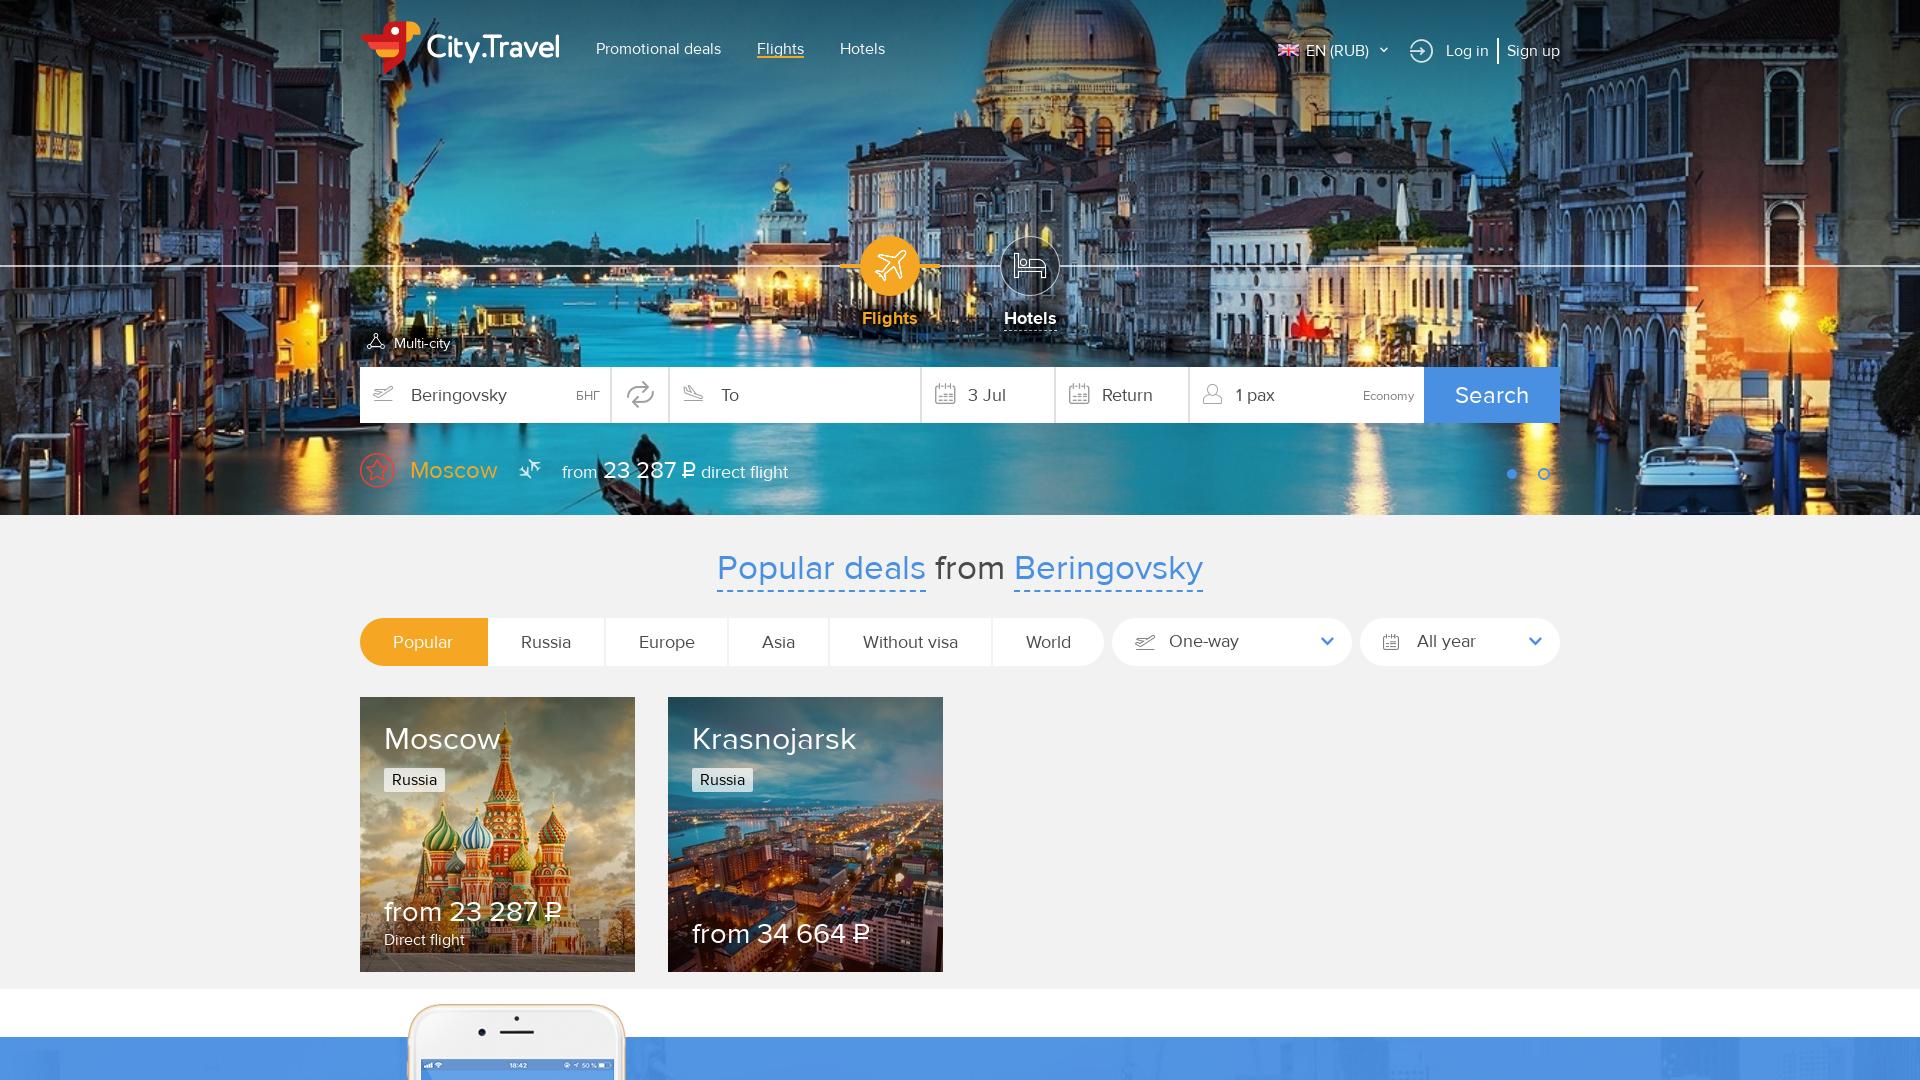 City.Travel website